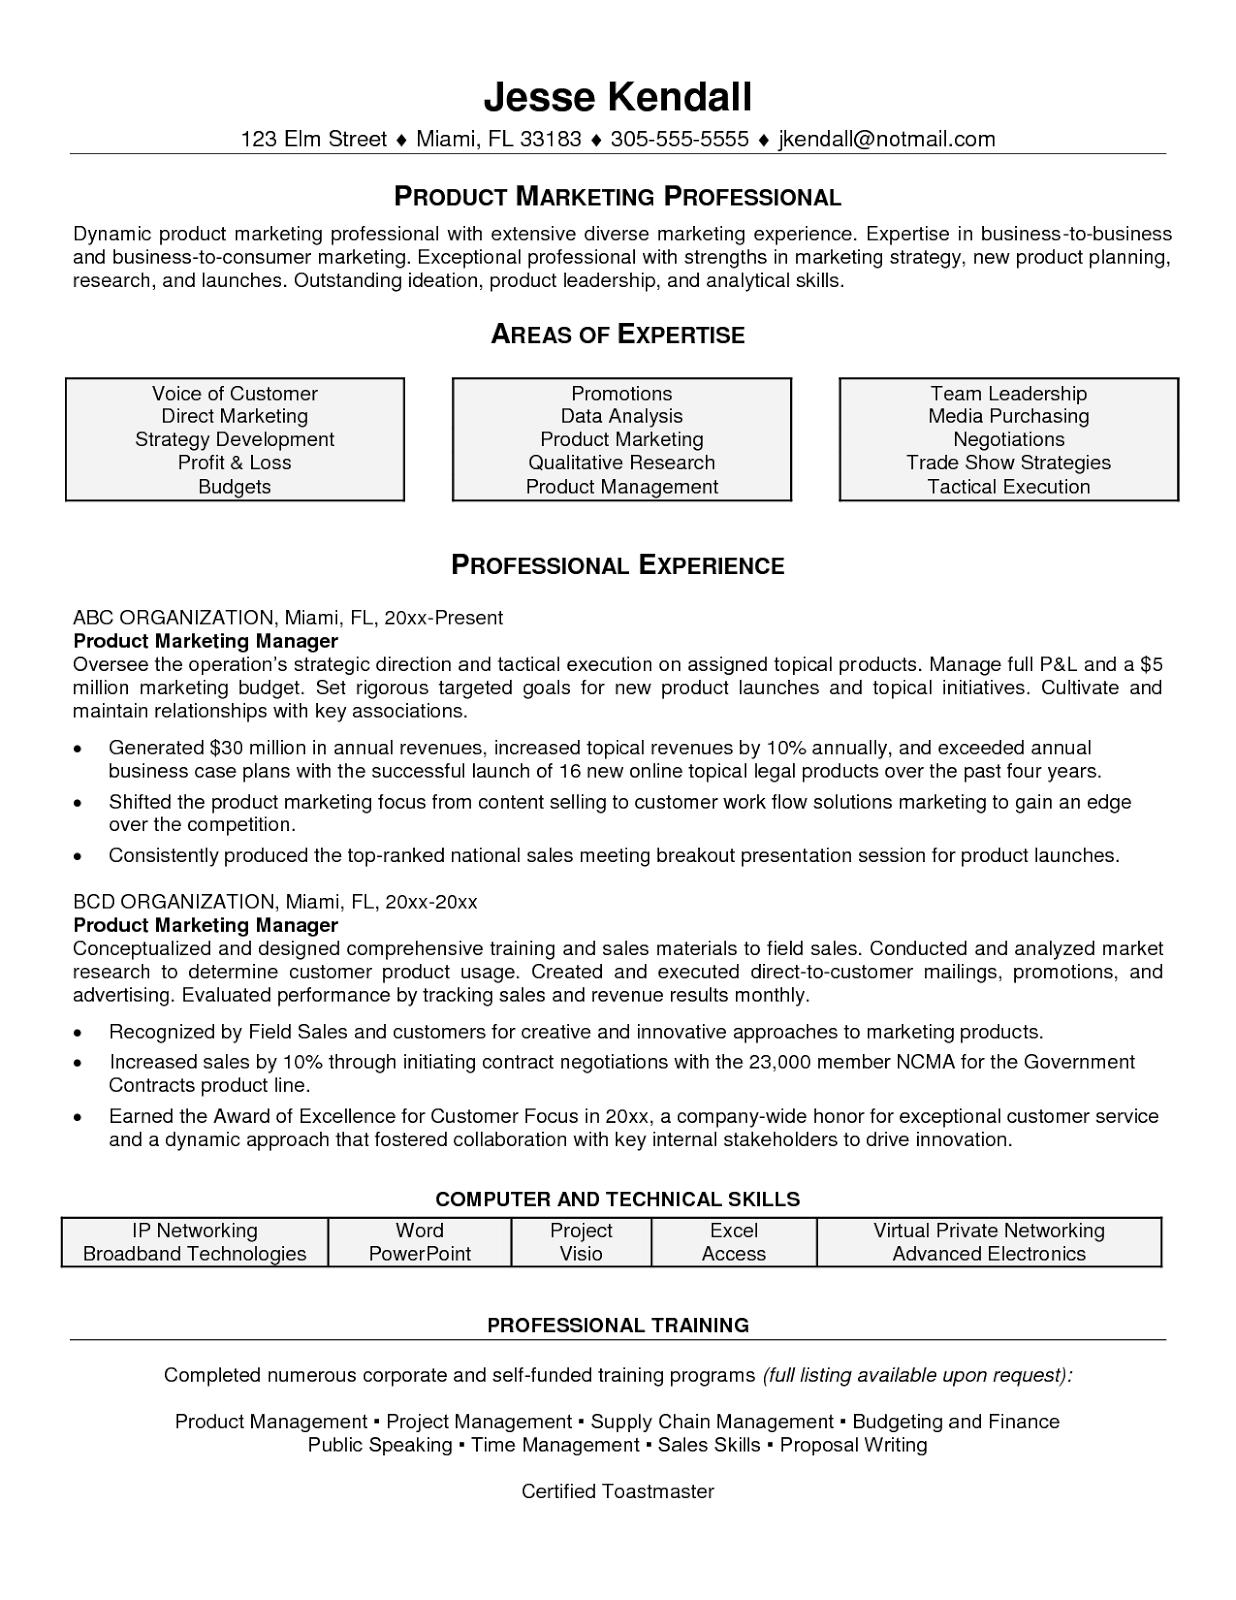 Marketing Manager Cv Example Marketing Manager Cv Example 2018 Marketing Manager Cv Examples Uk Marketing Mana Marketing Resume Manager Resume Resume Skills